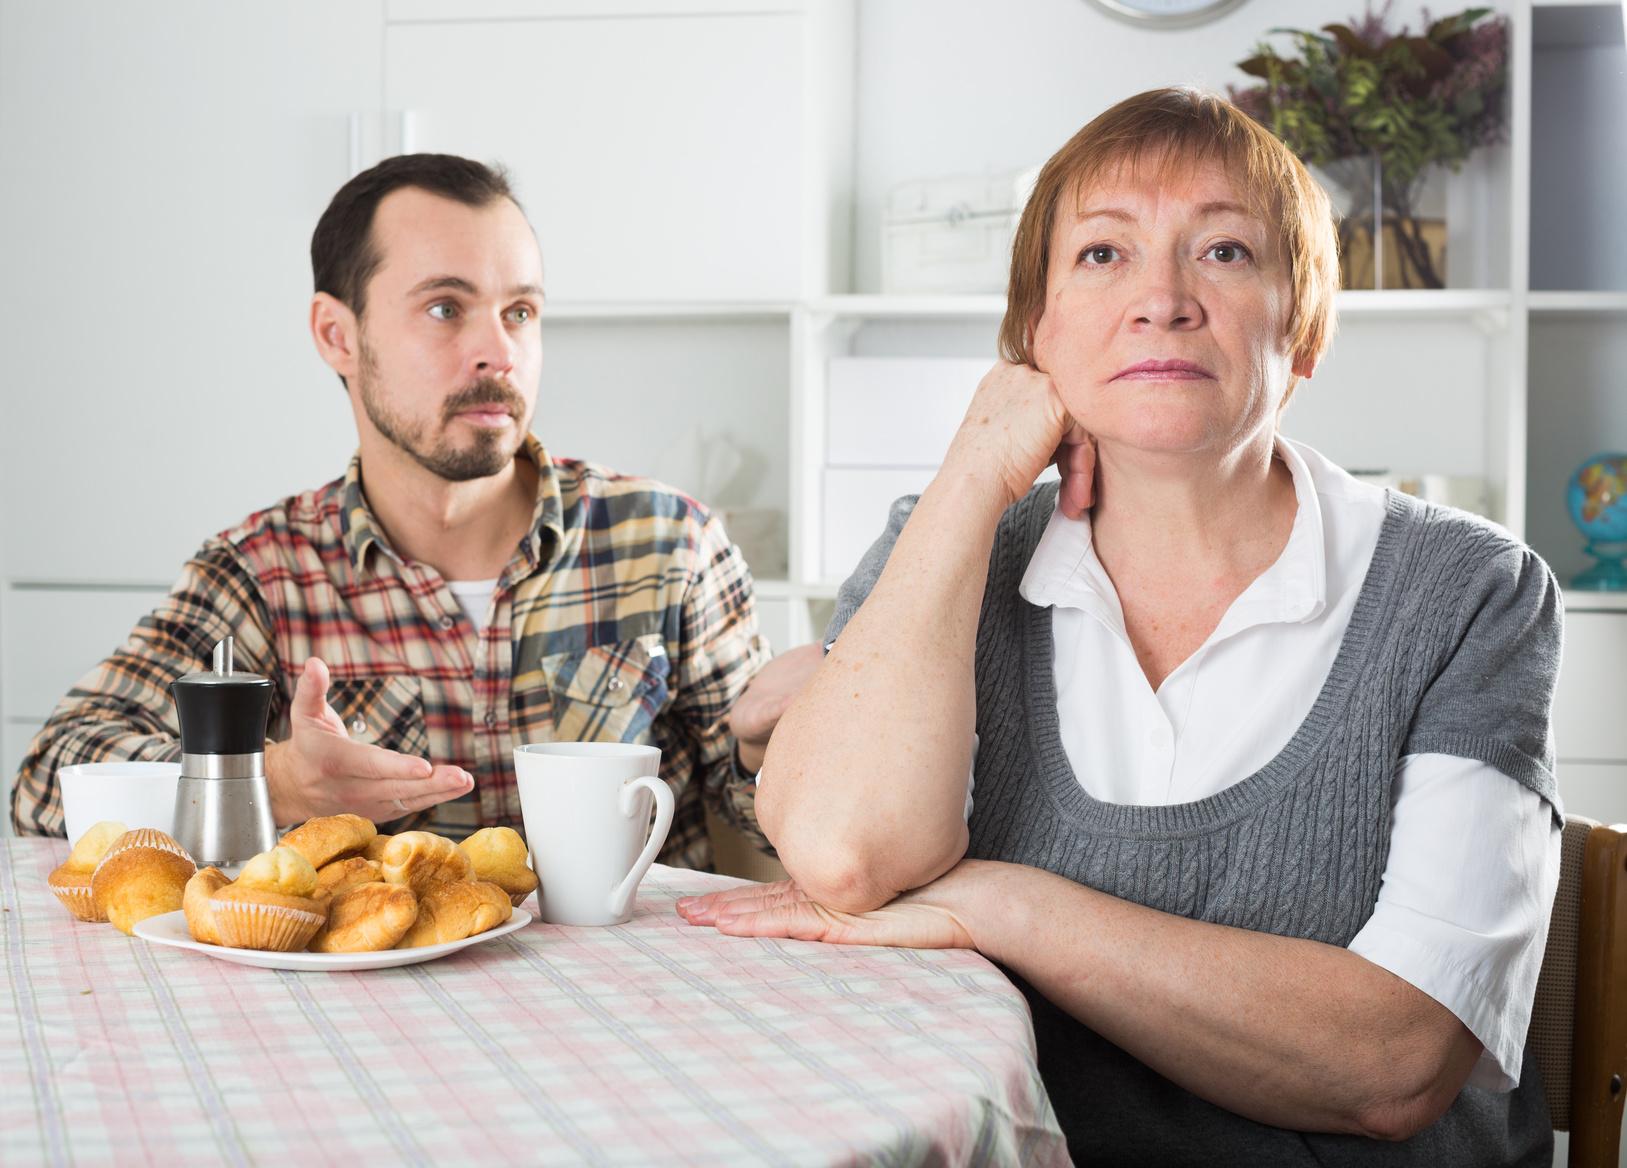 Elderly mother resents her son